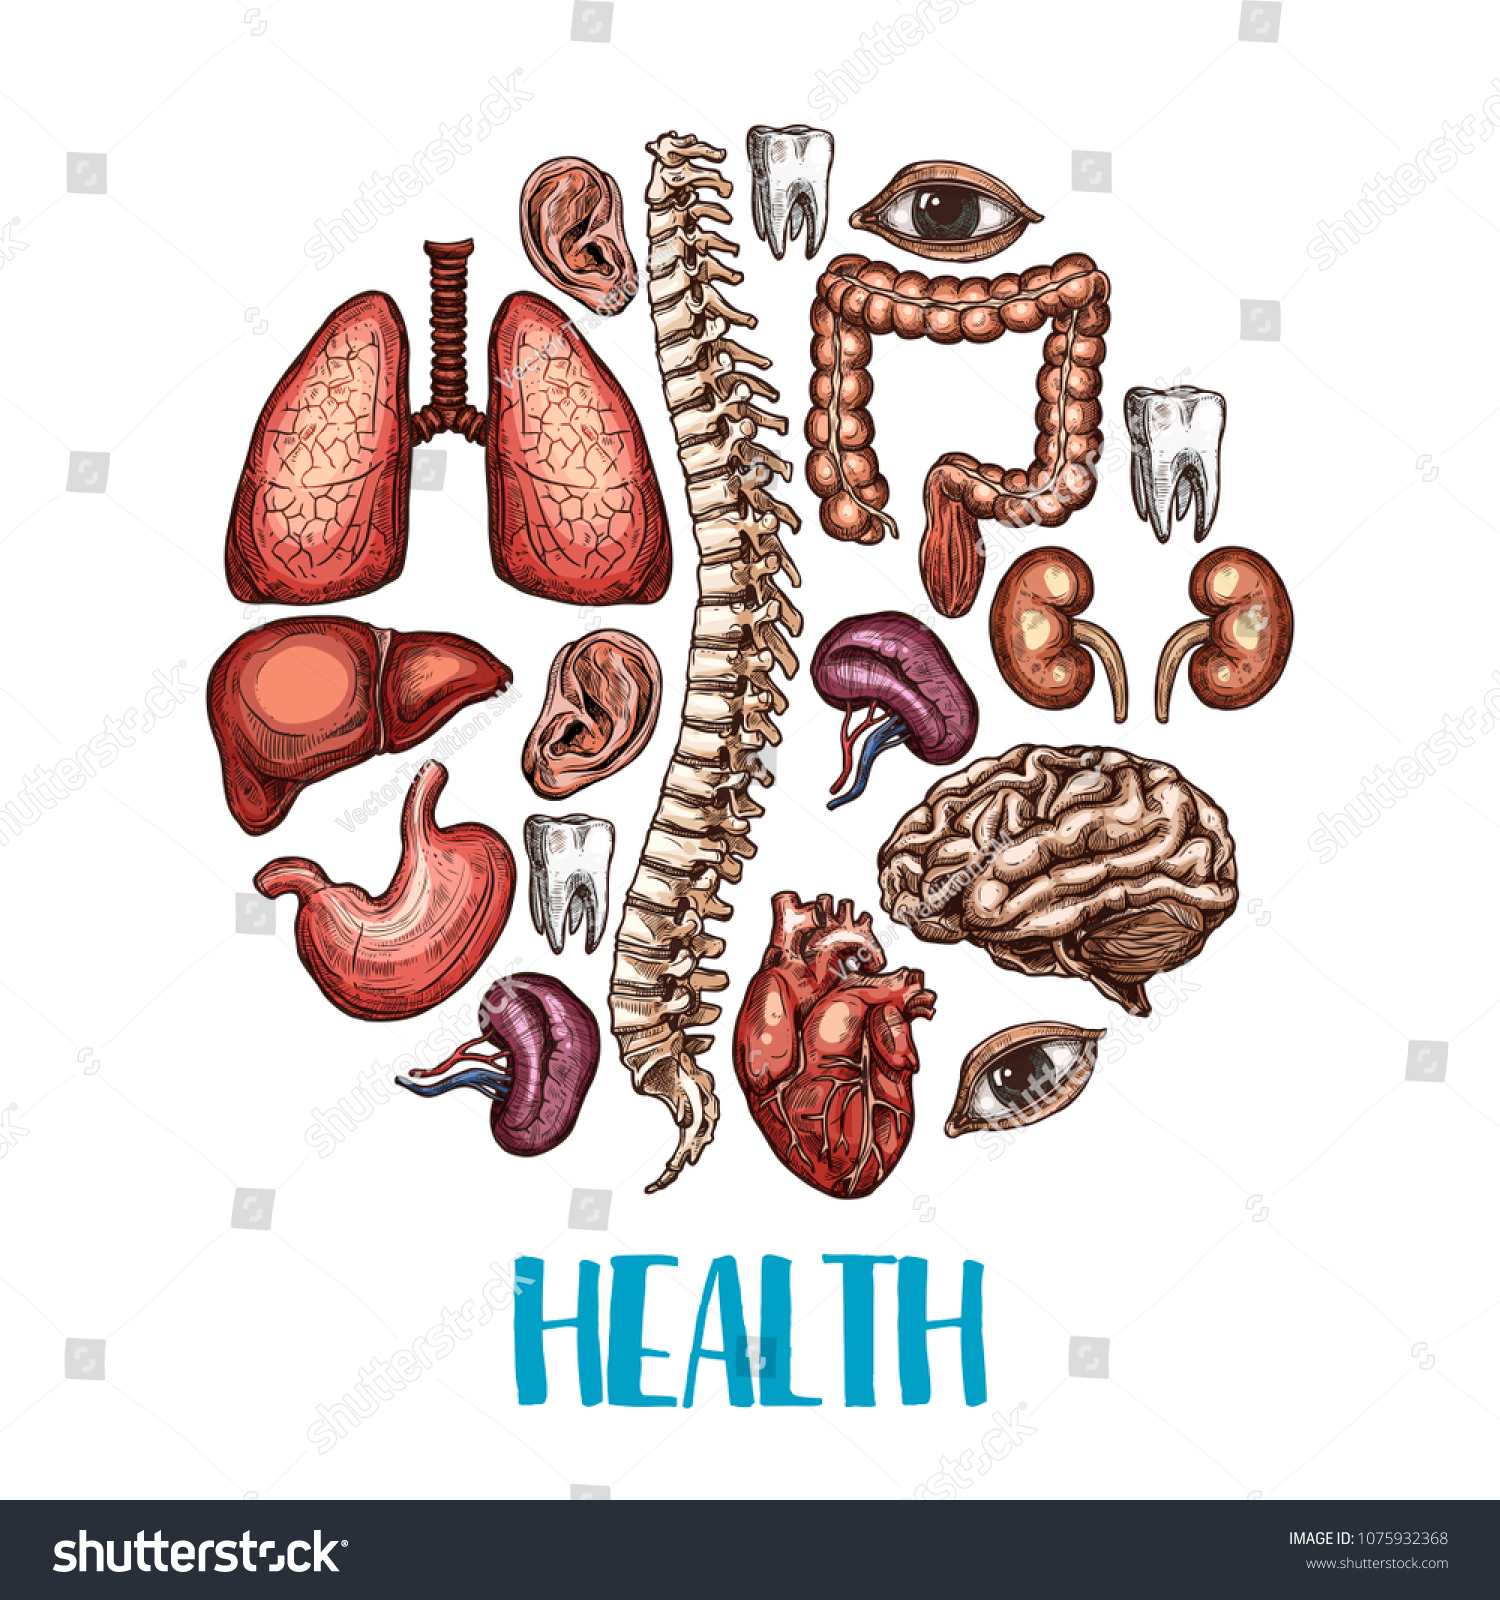 Health Poster Human Body Organs Vector Stock Vector (Royalty Free ...